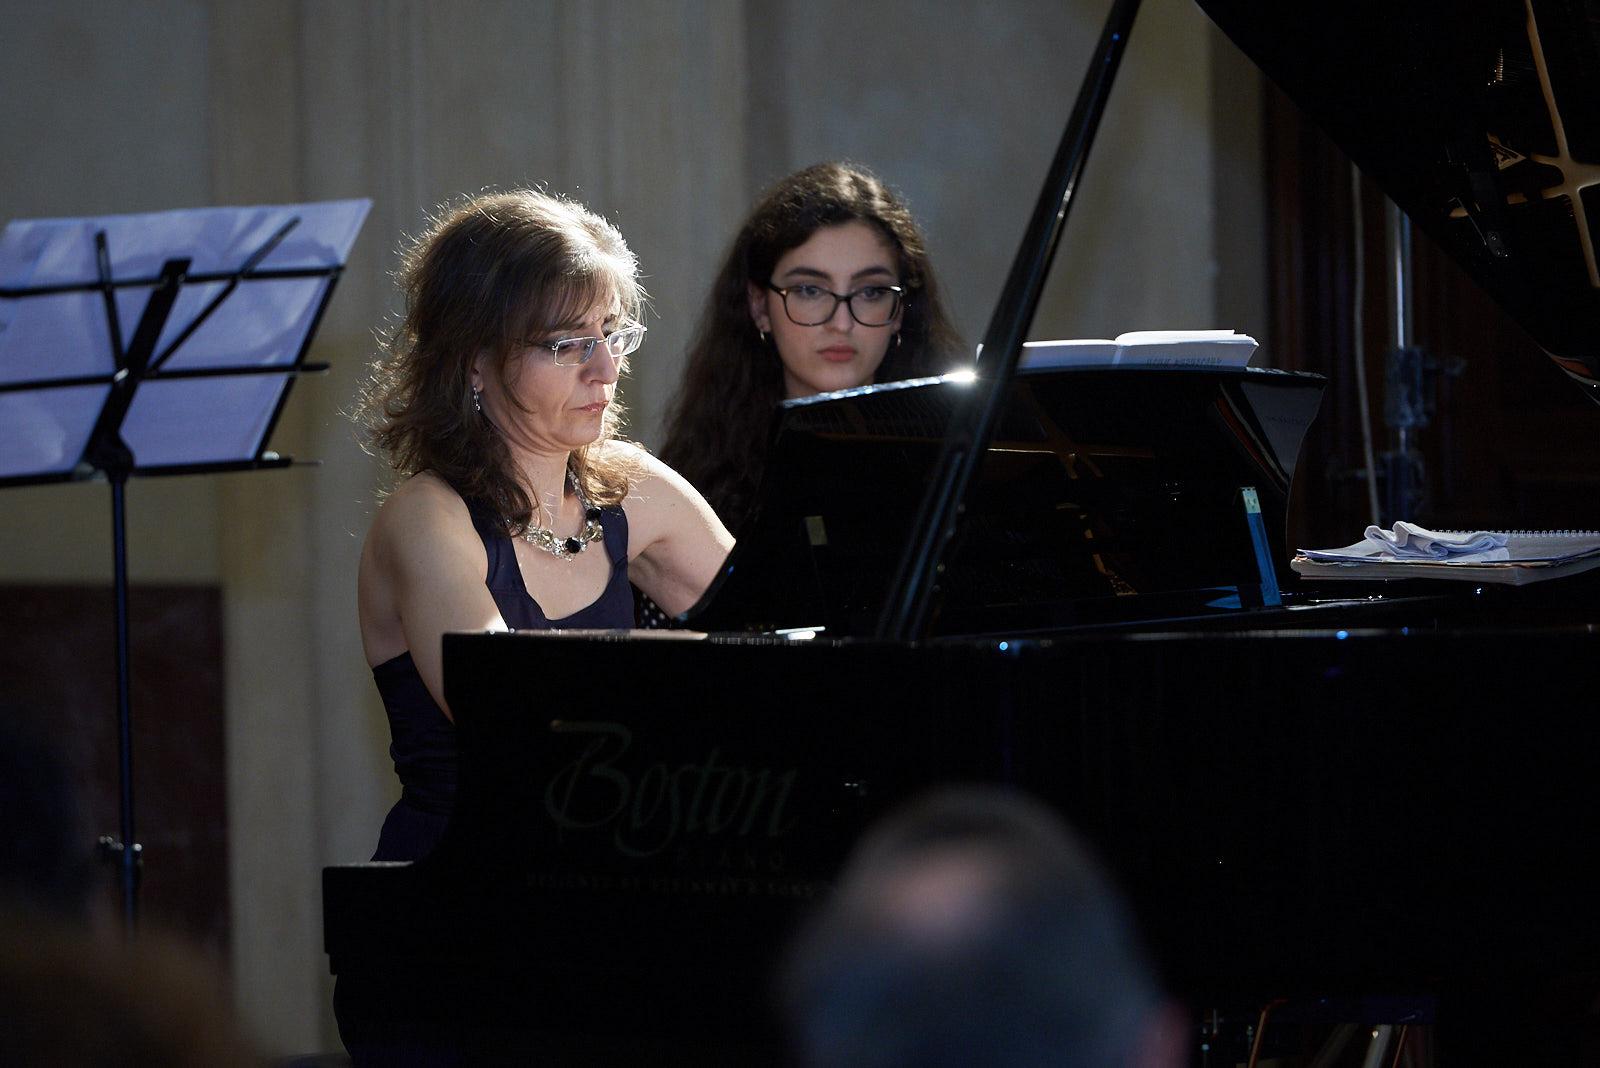 La pianista Ani Martirosyan